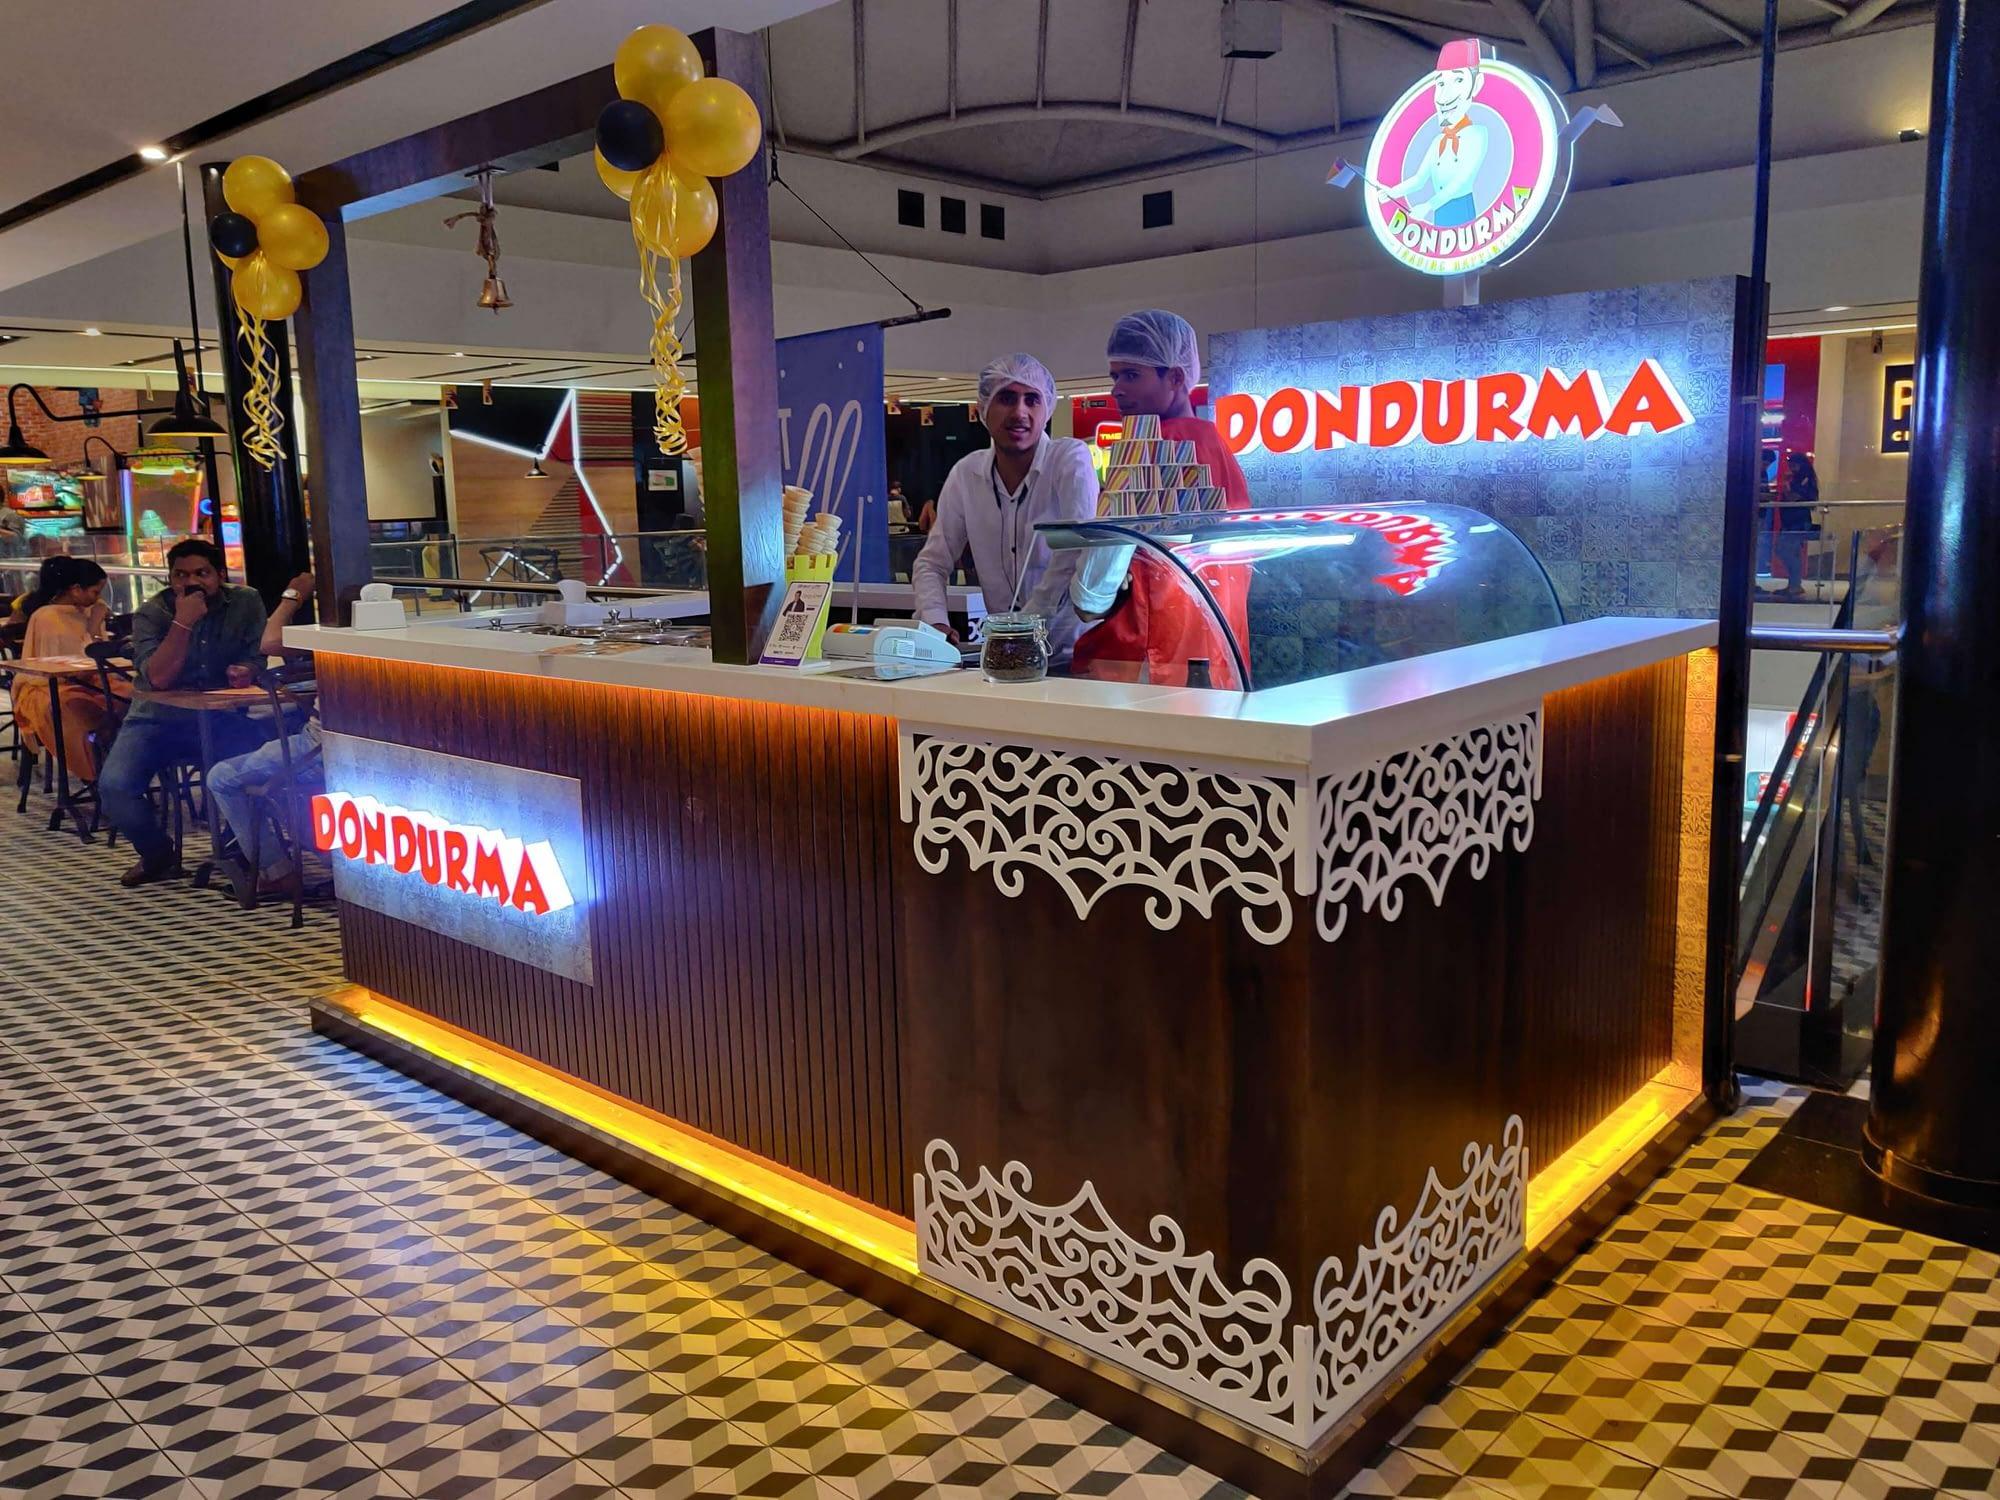 Dondurma Turkish Ice Cream Kiosk - View 05